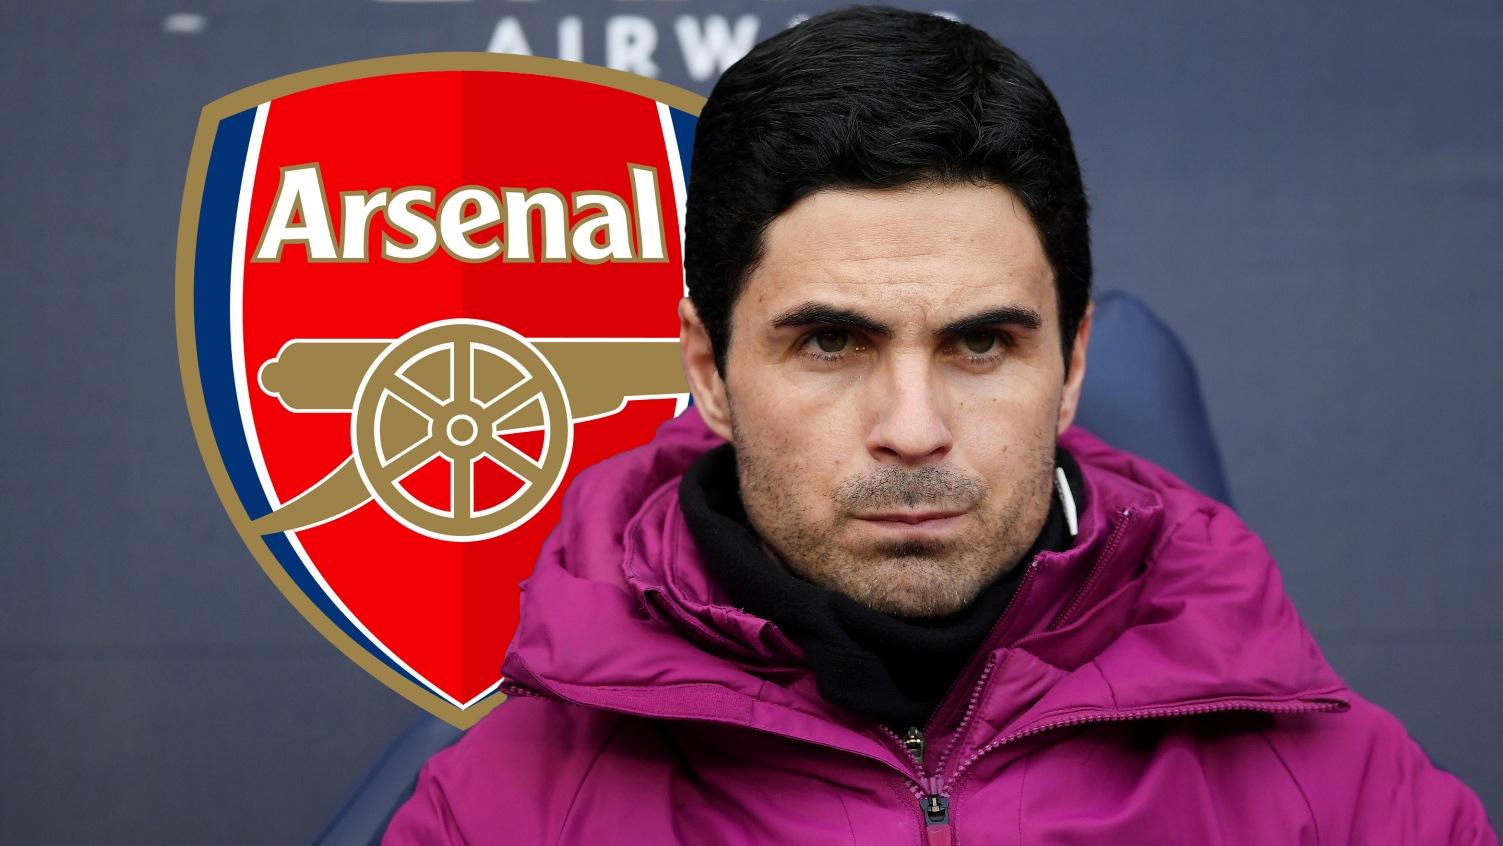 Arsenal boss Arteta tests positive